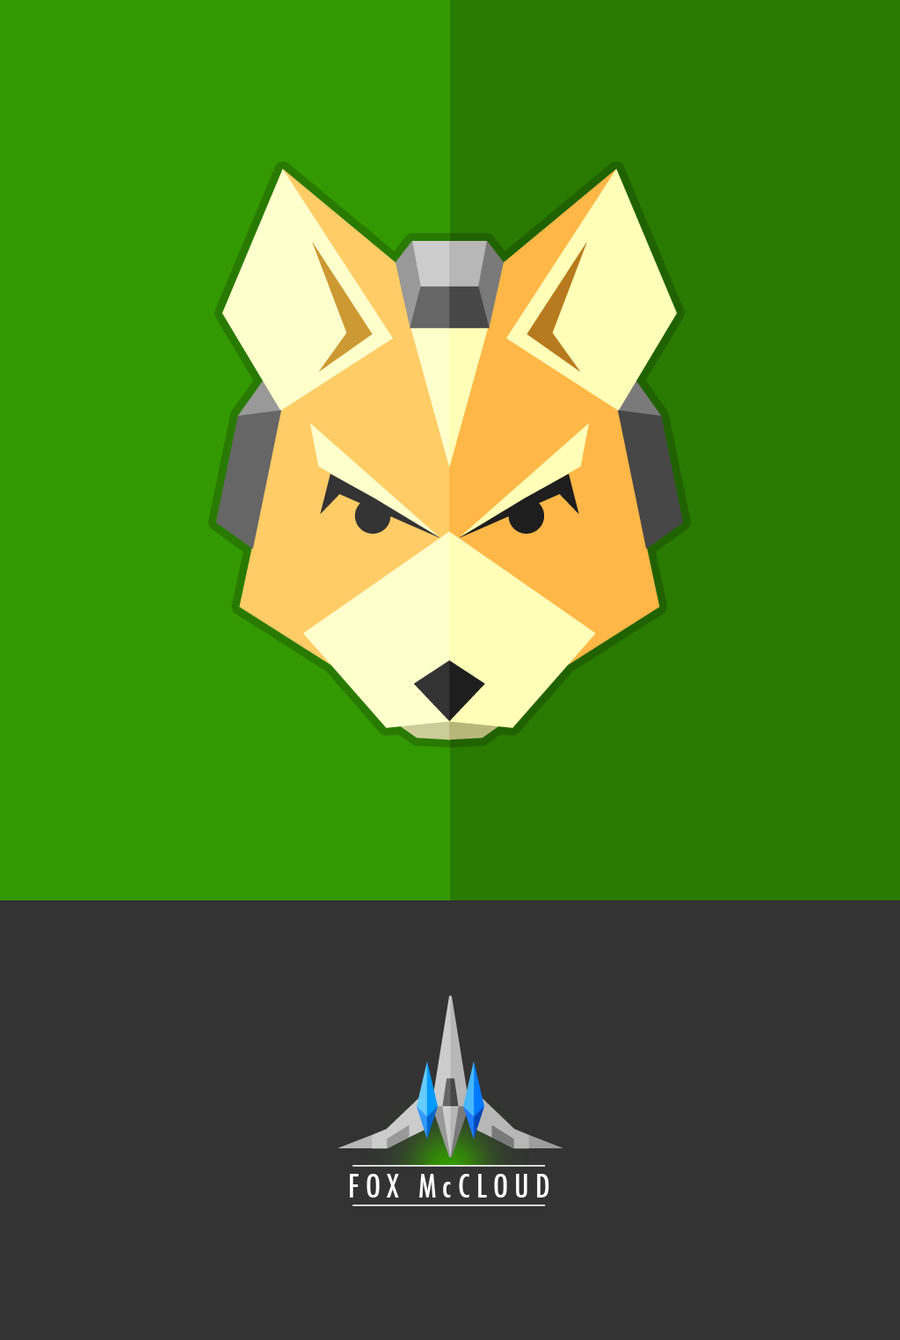 Fox McCloud by WEAPONIX